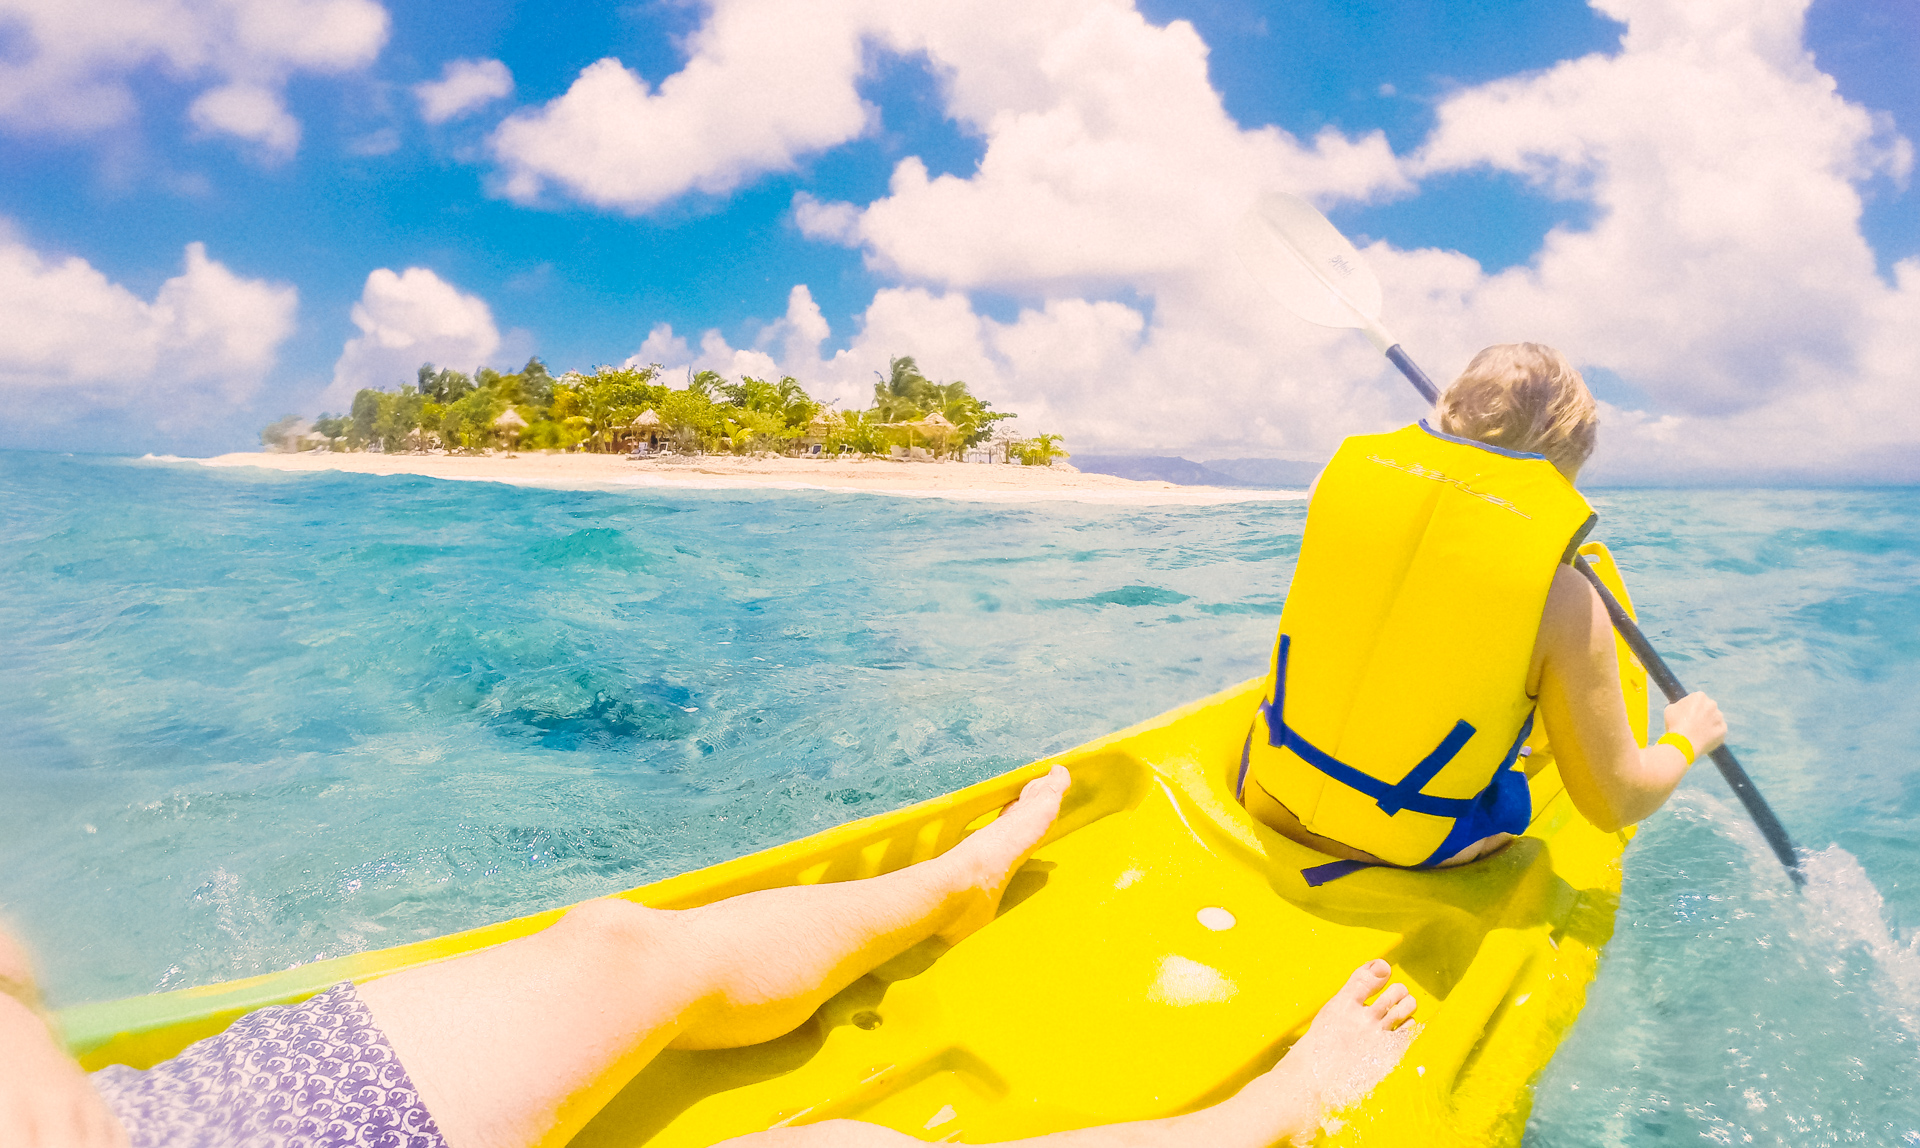 Kayaking around South Sea Island, Fiji